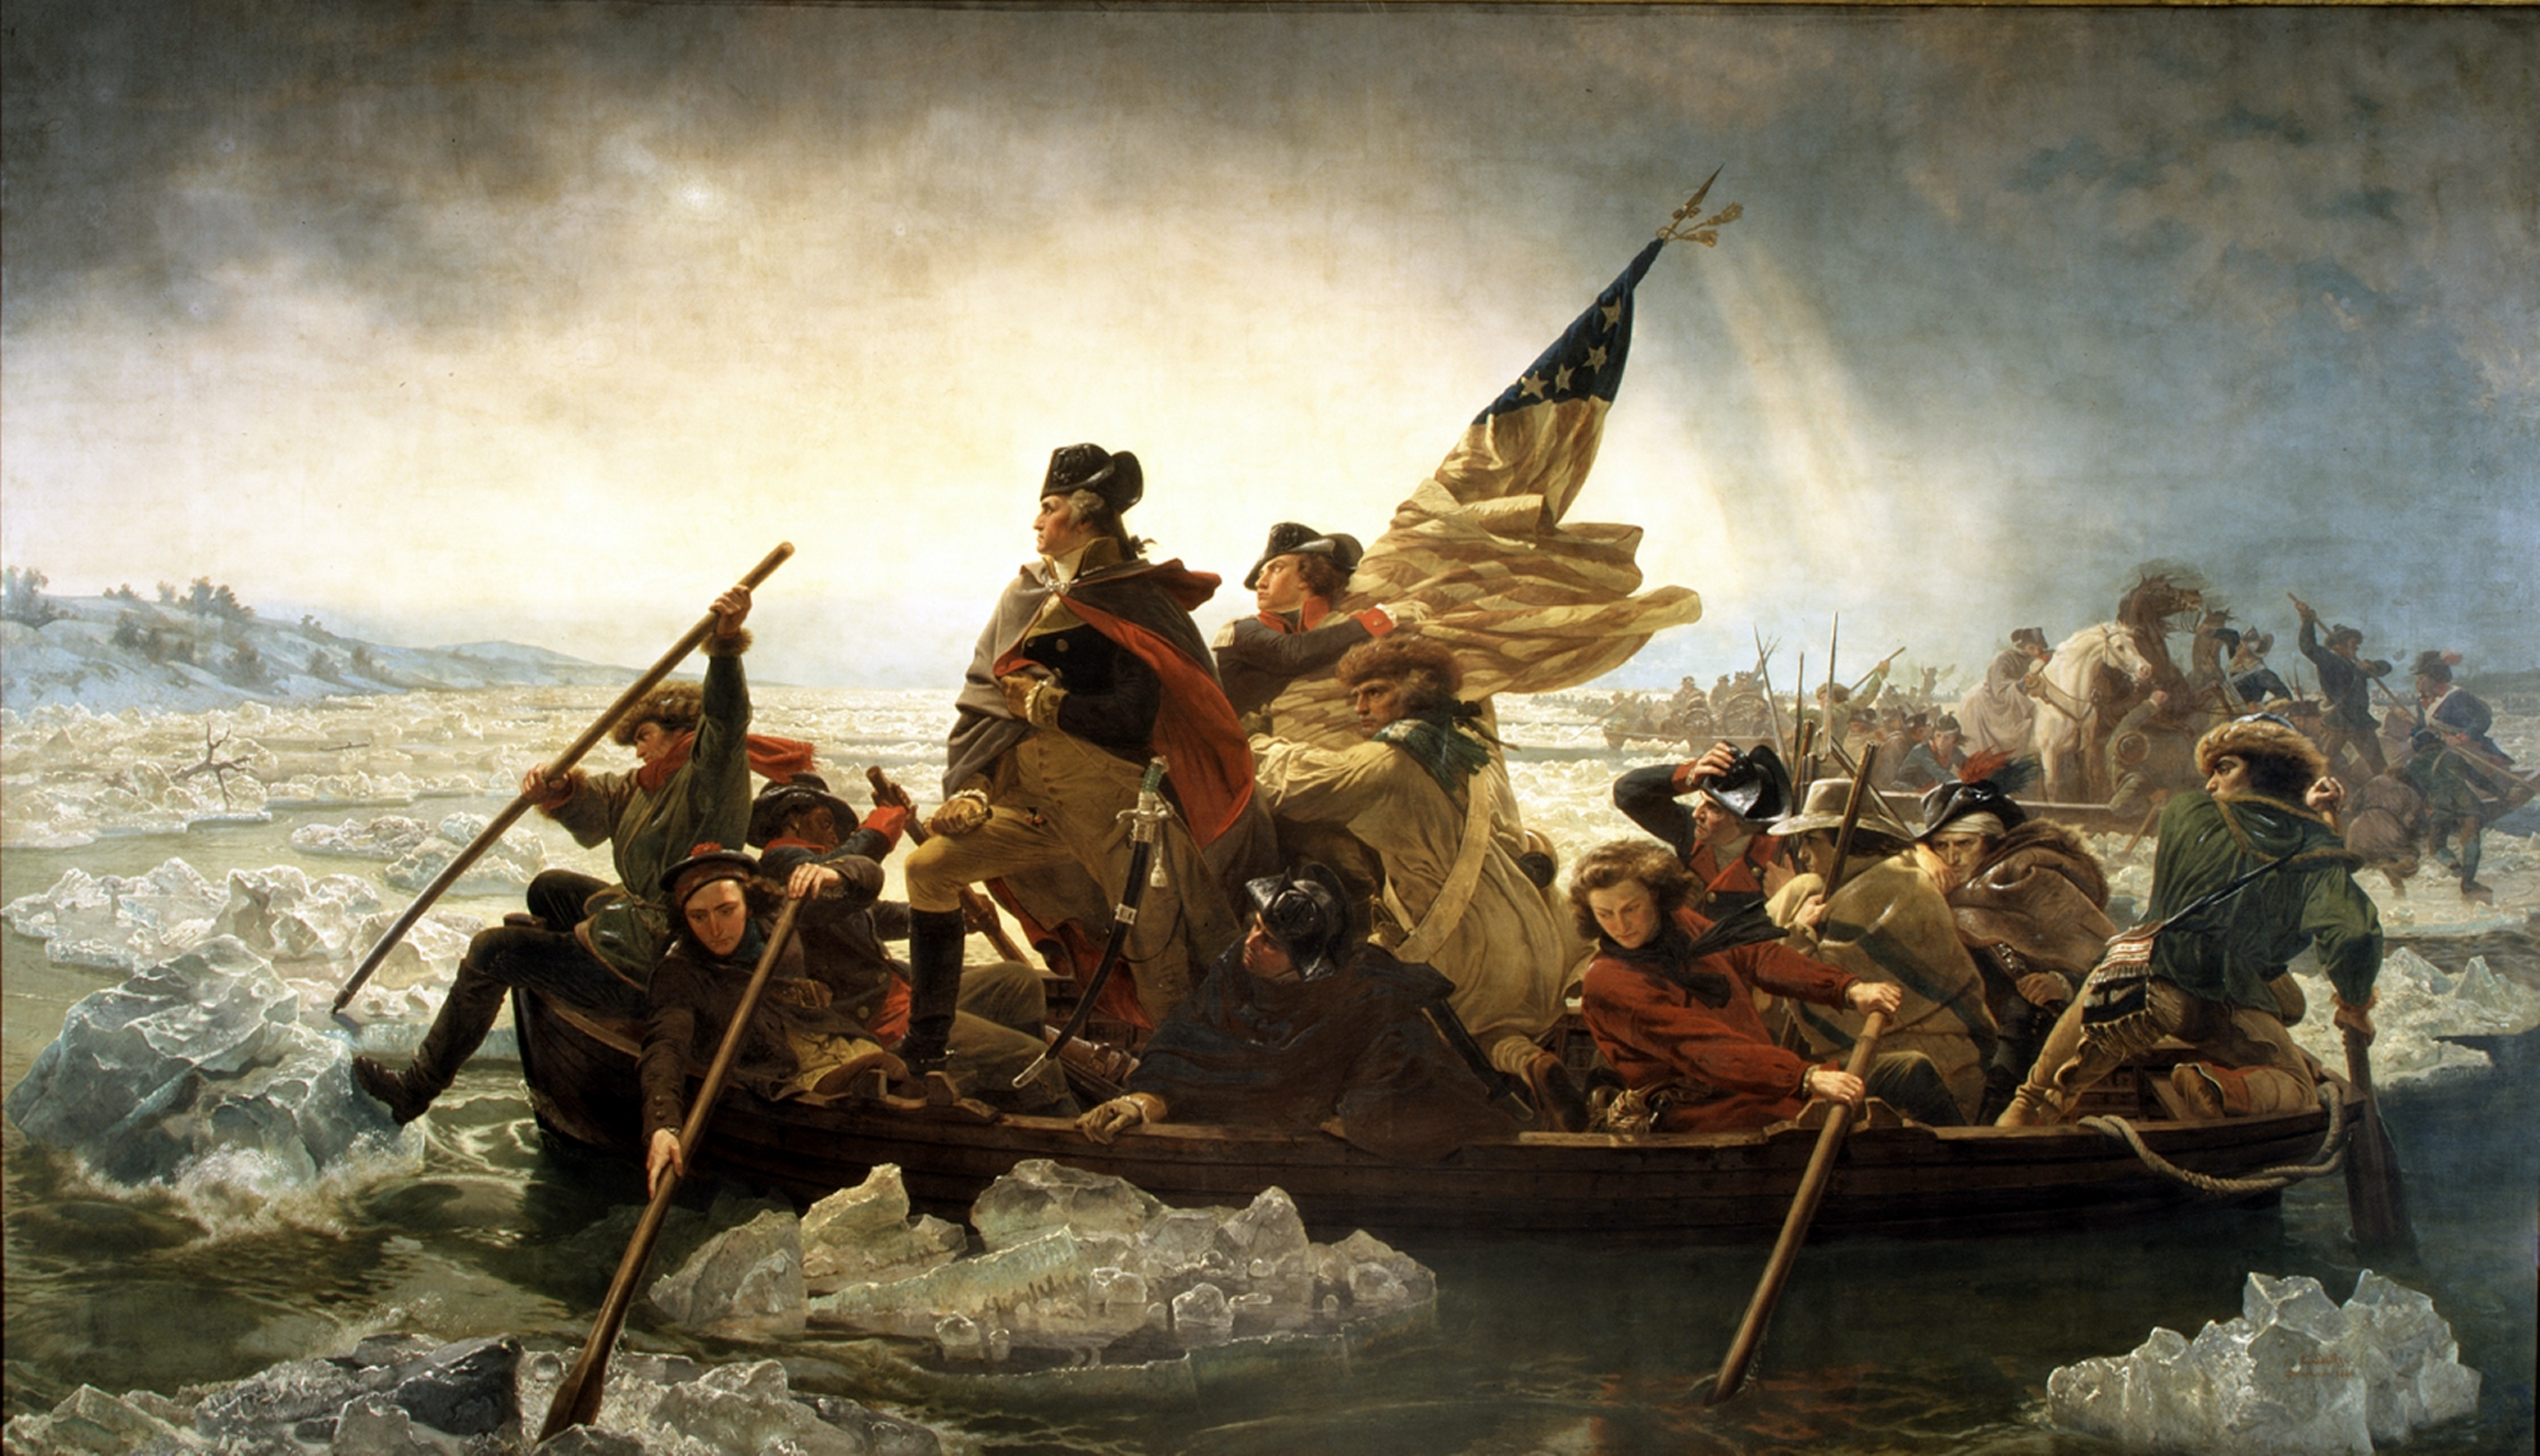 Proč je Assassin's Creed 3 zasazen do Americké revoluce? 61456